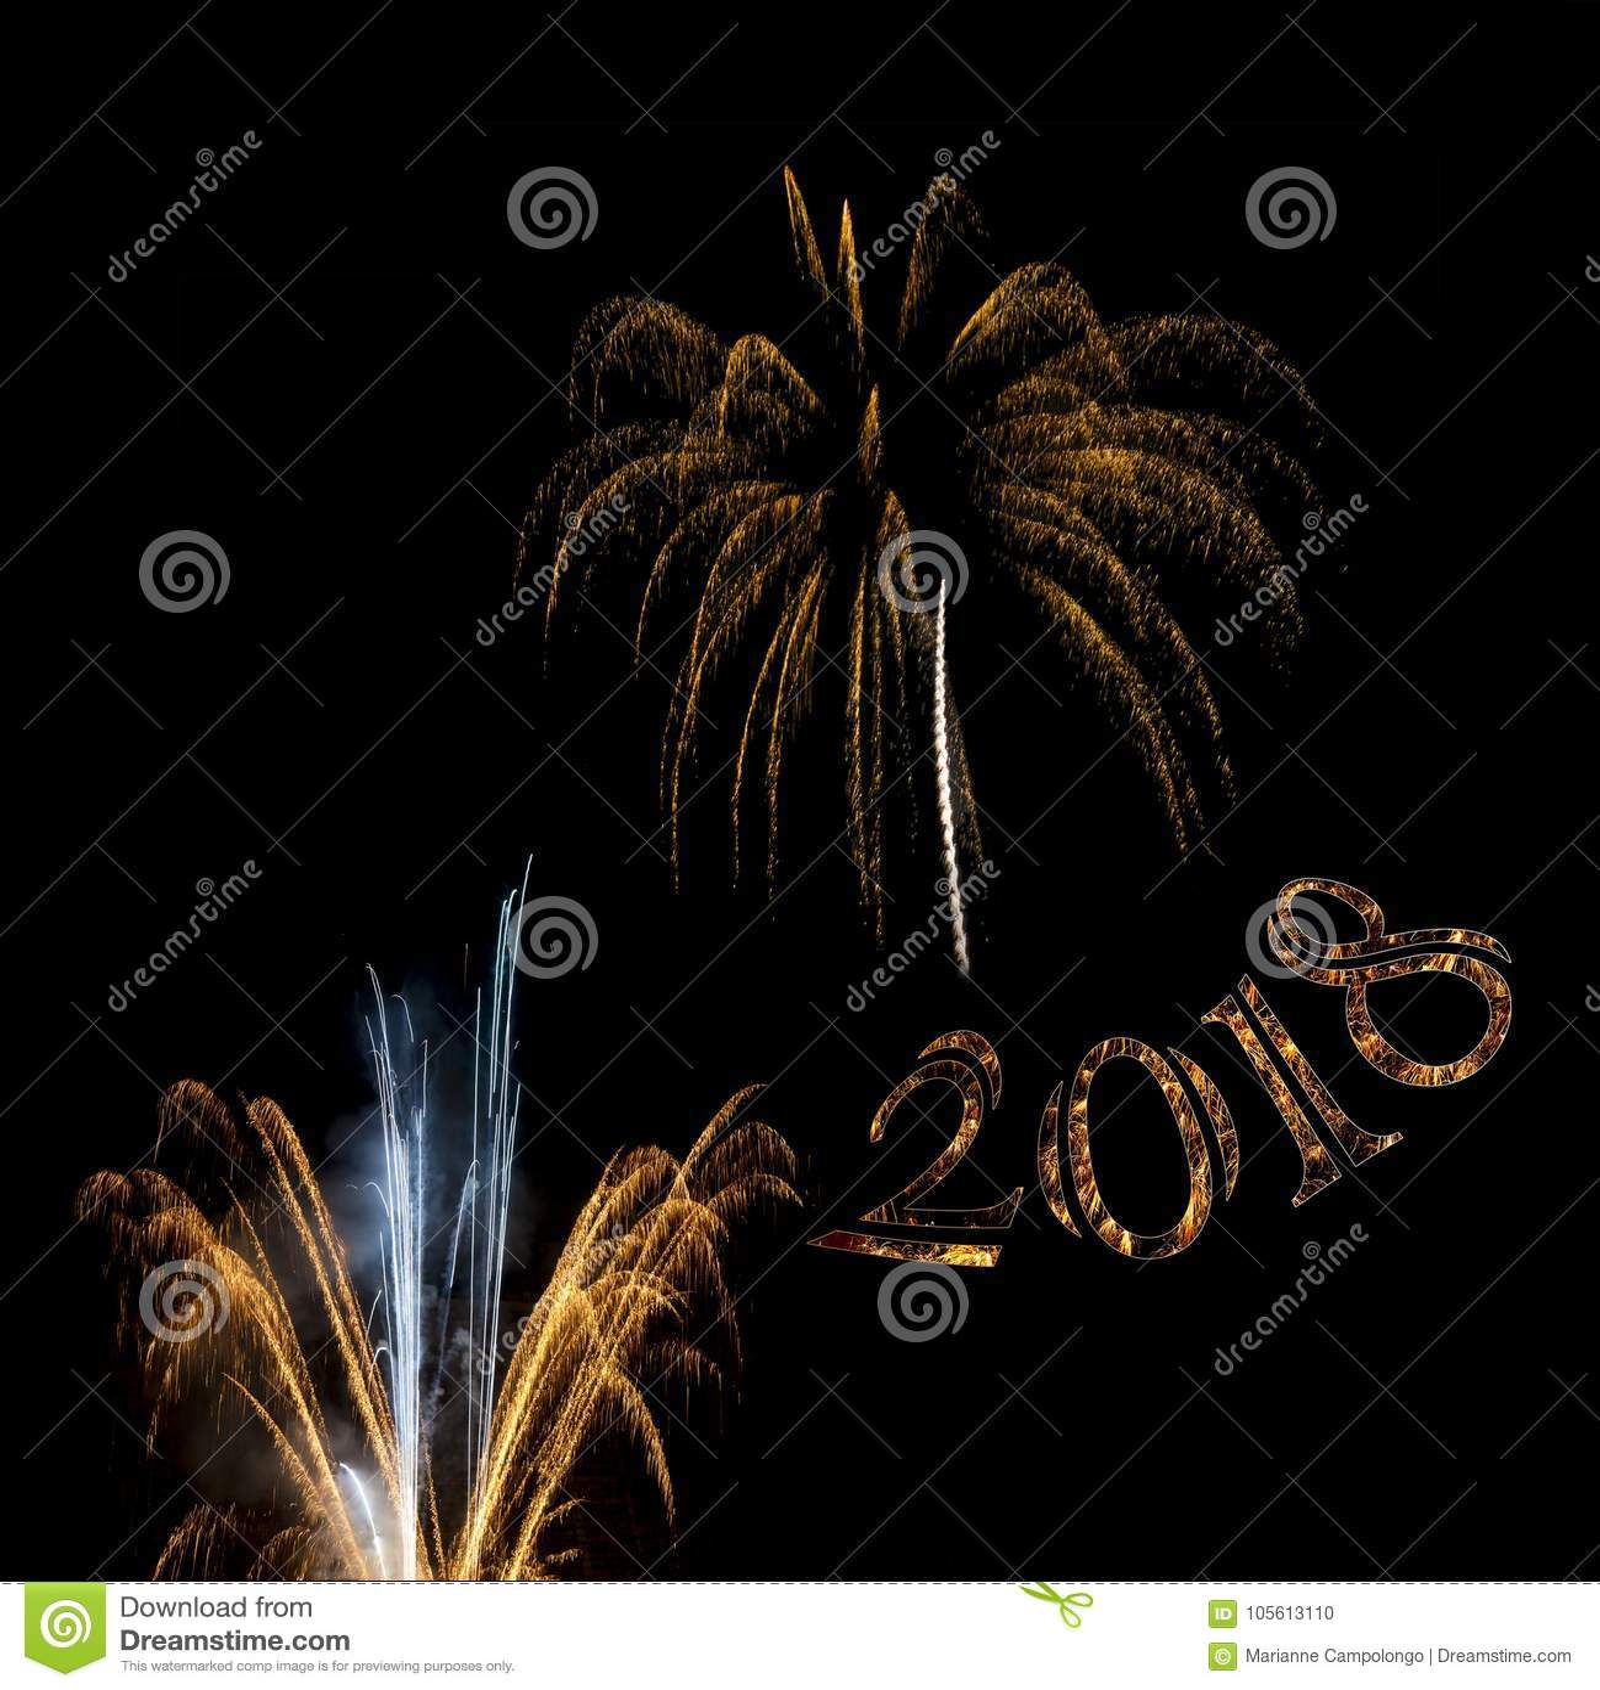 Fireworks 2018 Golden elements